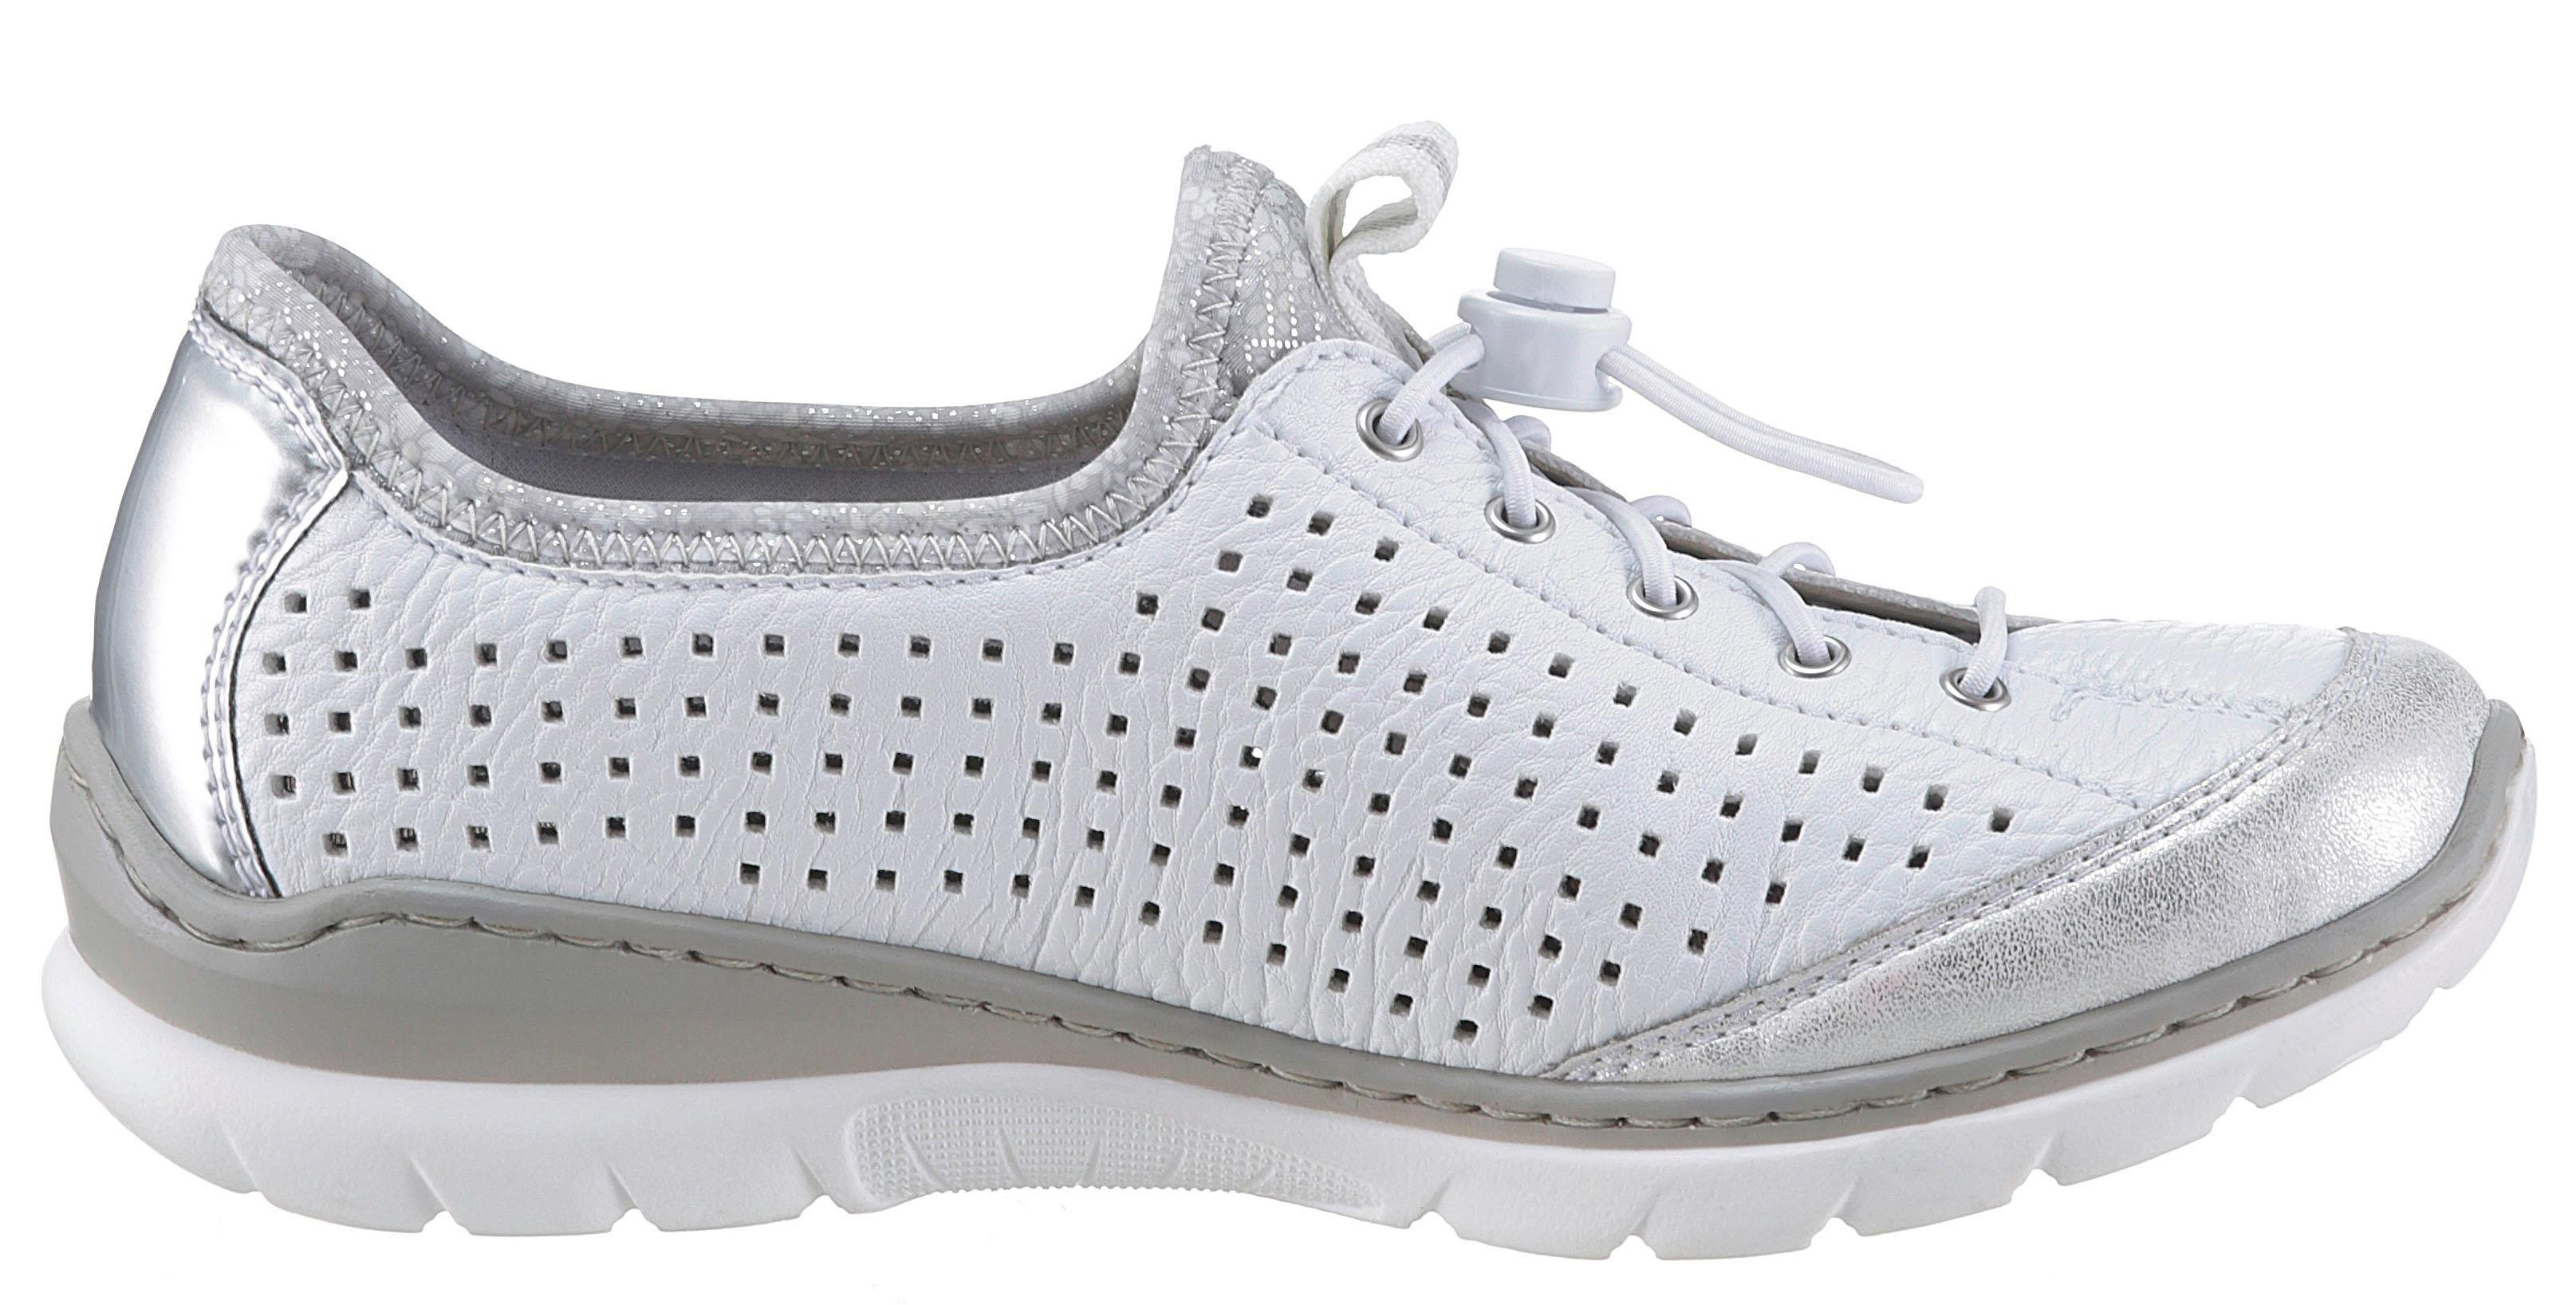 Rieker on Online Slip Bestellen Sneakers QxdsrBhtC